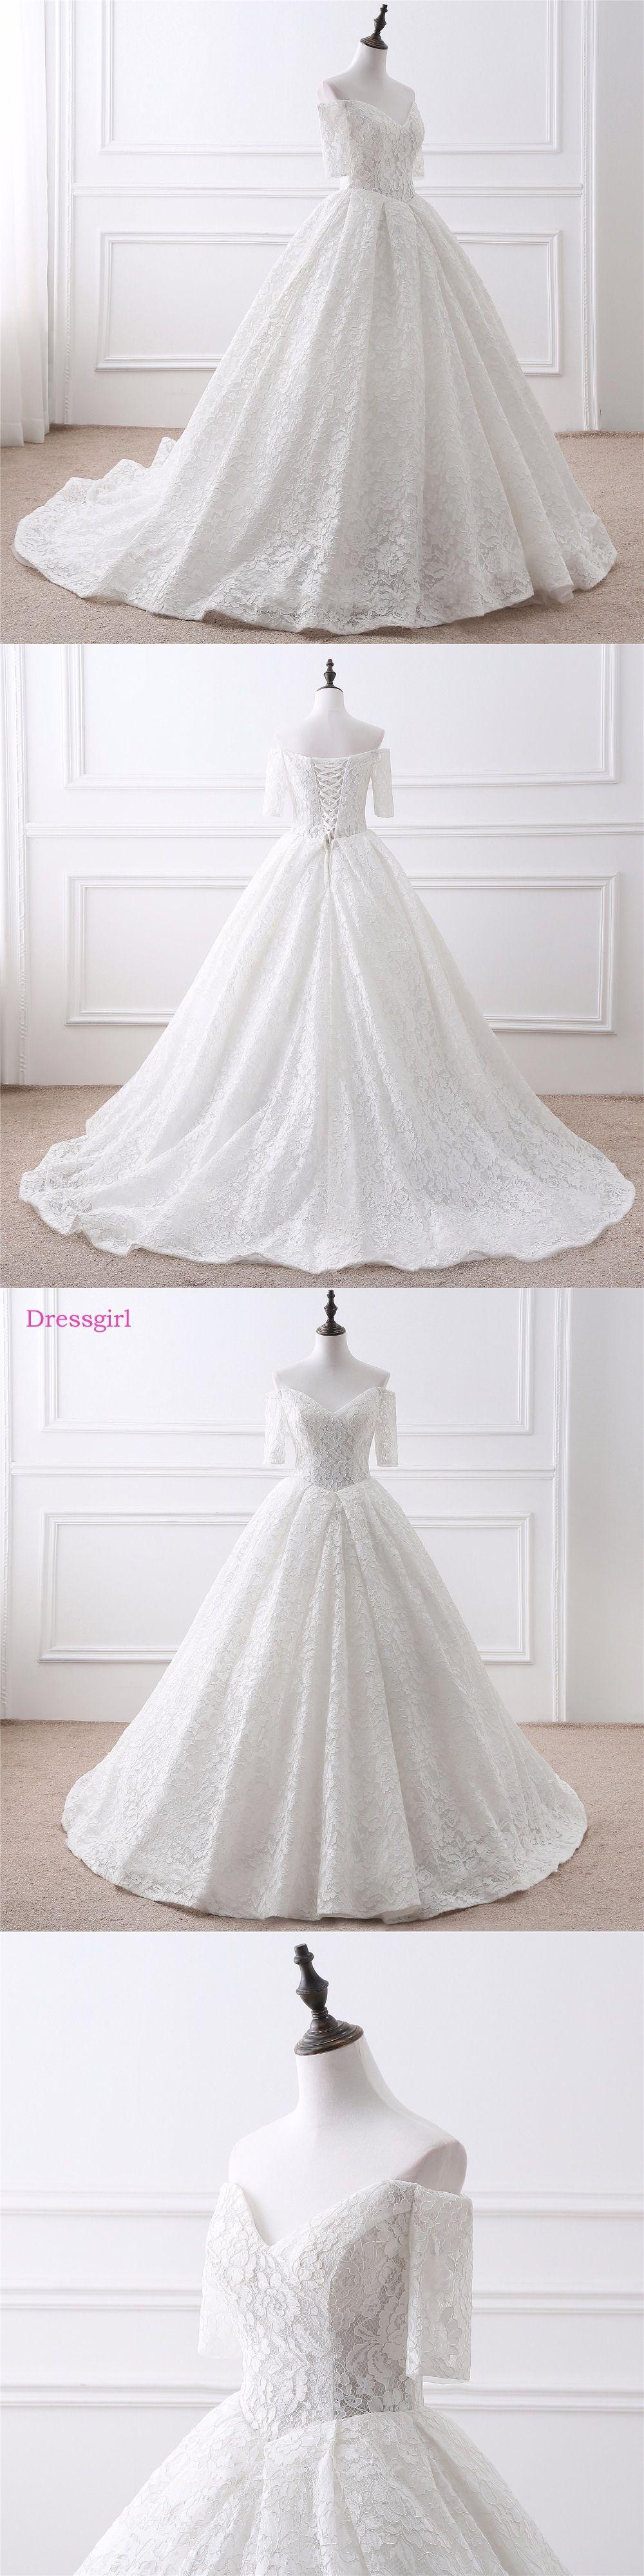 Lace vestido de noiva wedding dresses ball gown vneck half